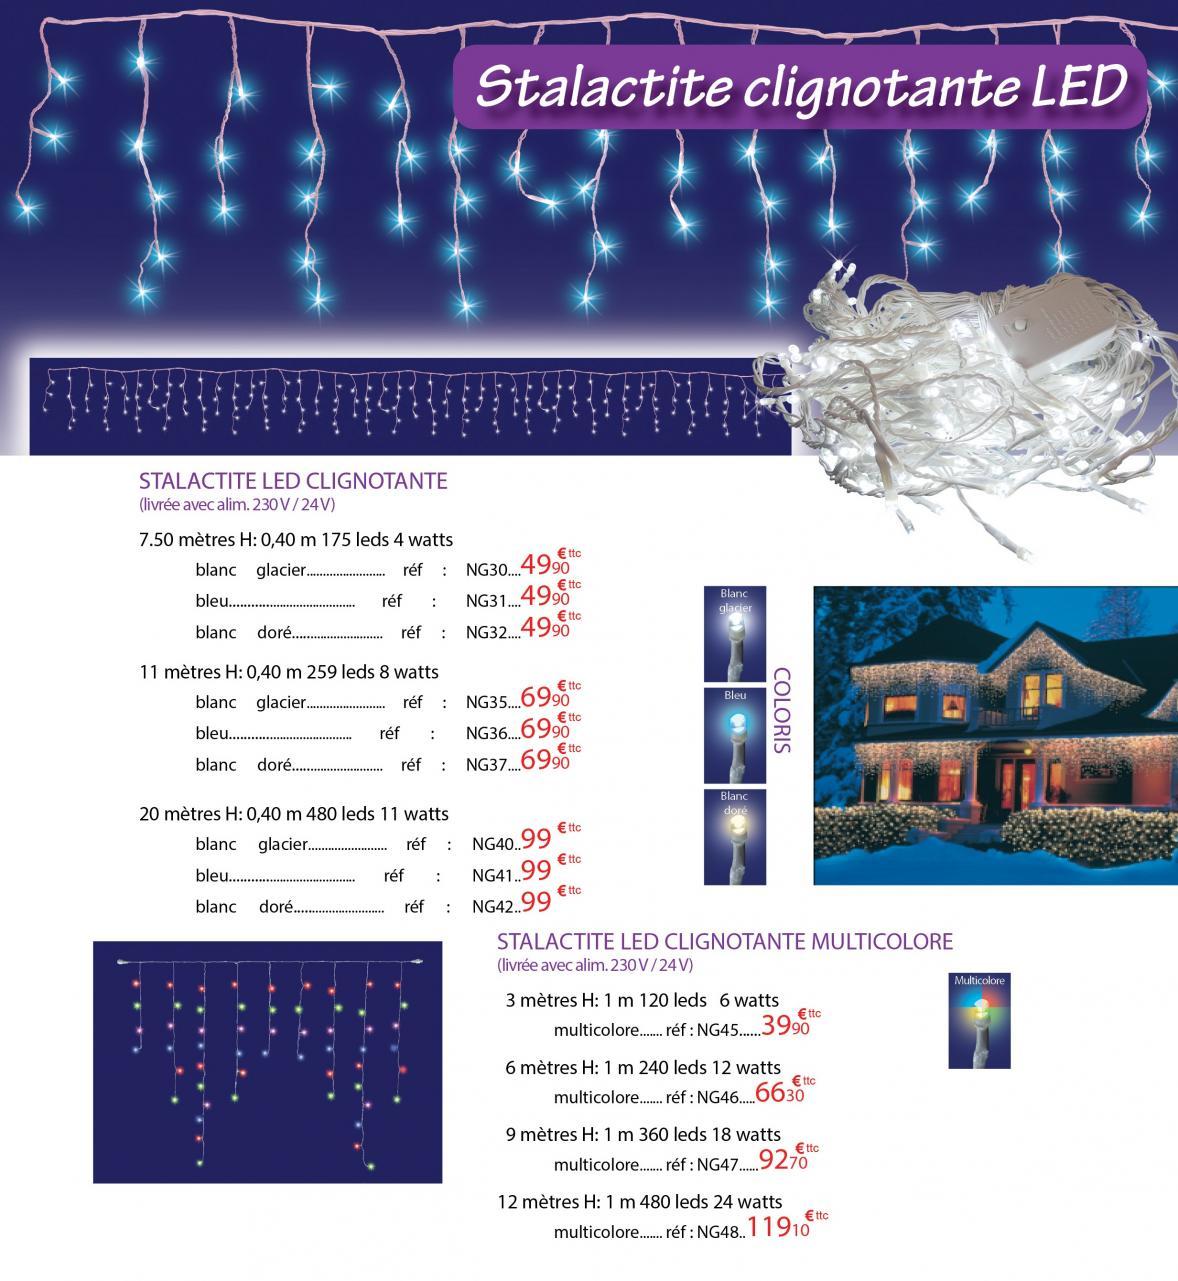 Stalactites clignotantes LED